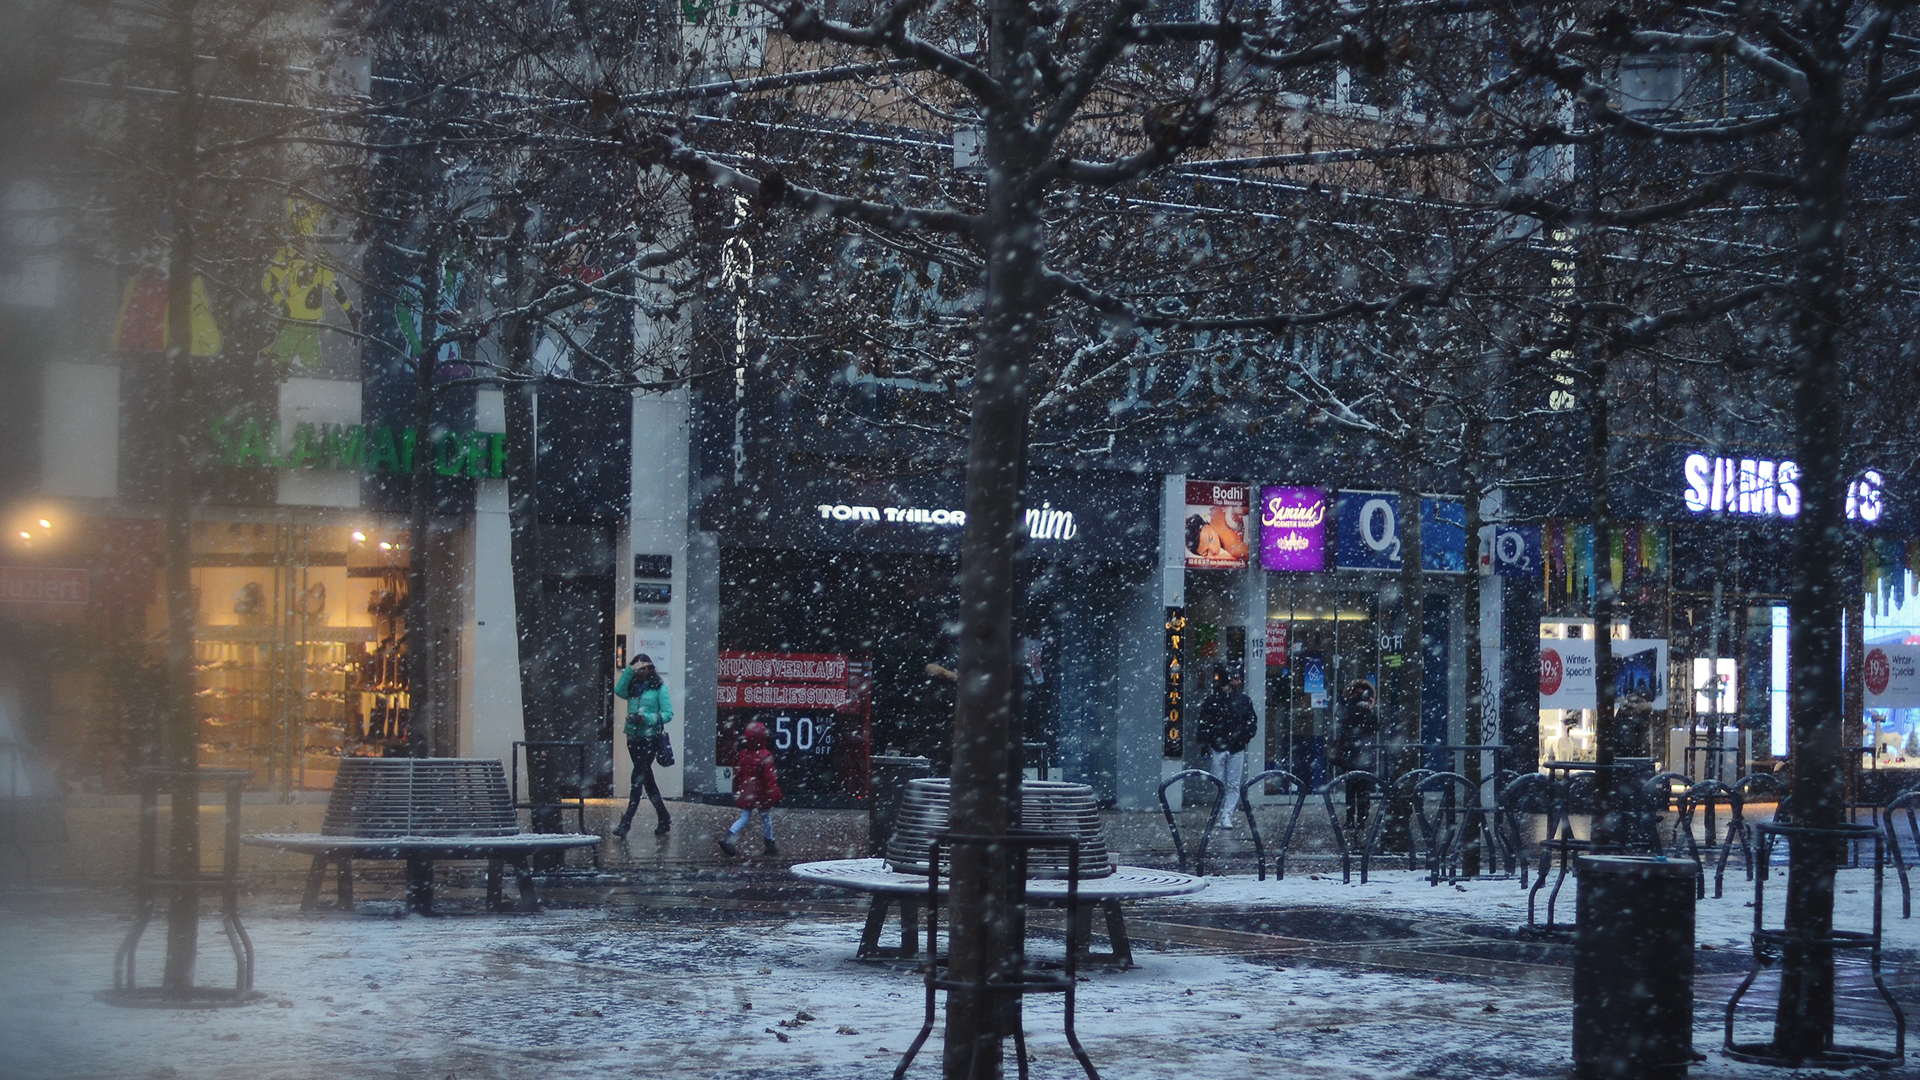 No suele nevar en Frankfurt, pero bueno.